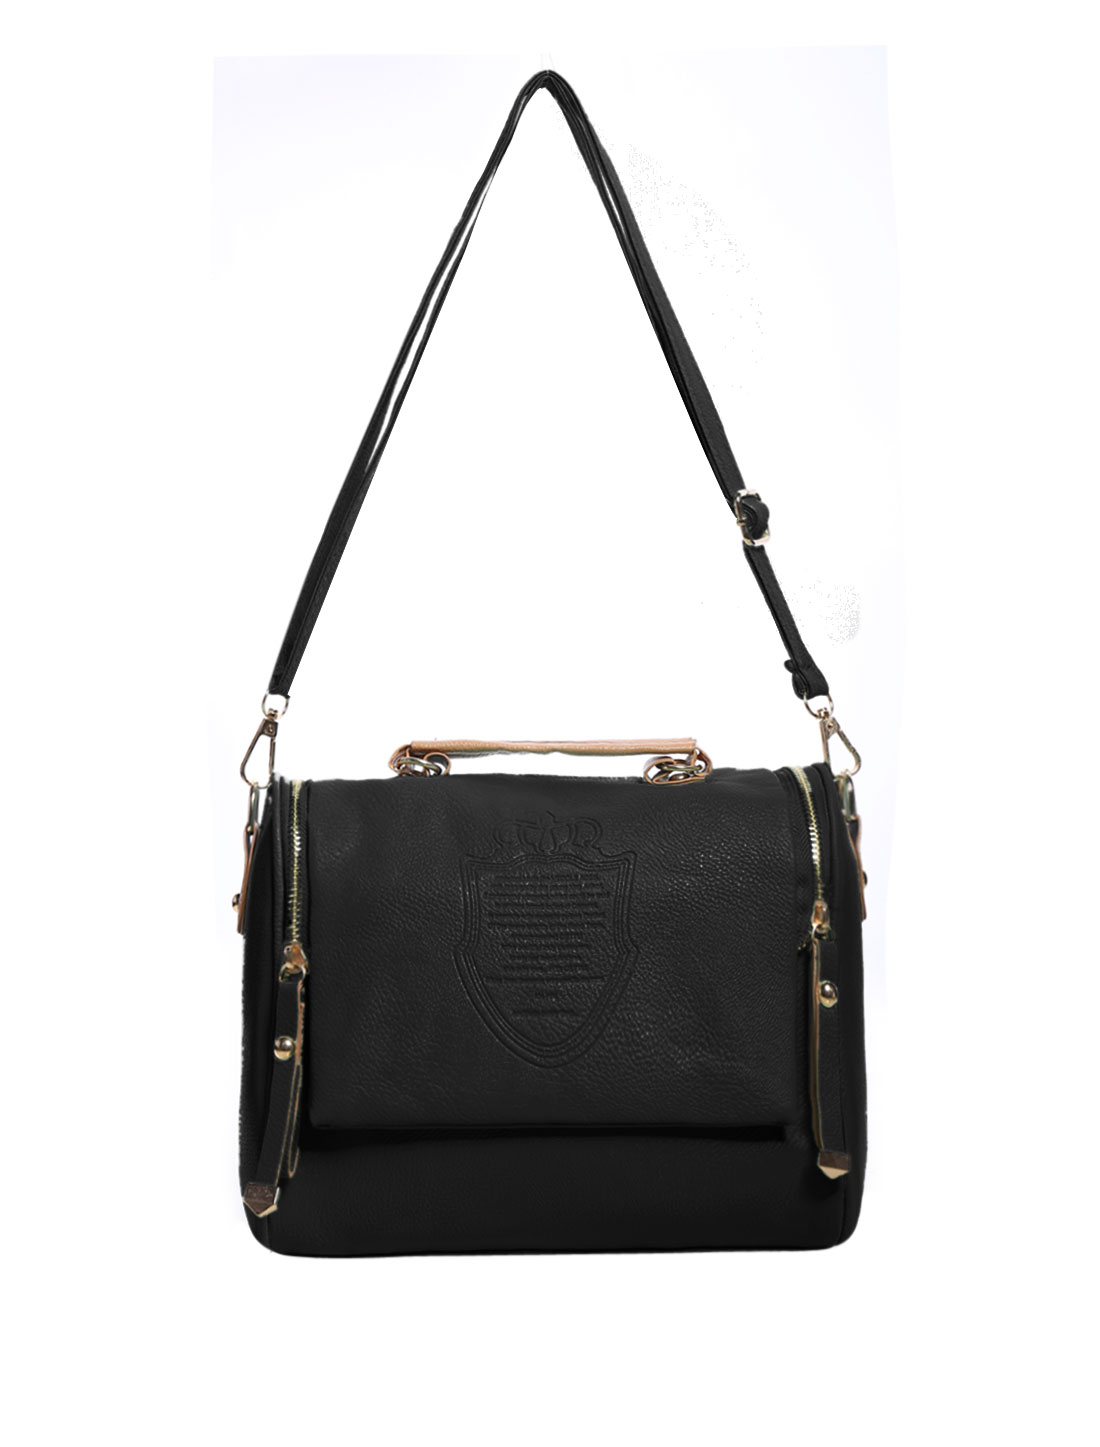 Retro Faux Leather Women Handbag Tote Satchel Women Messenger Shoulder Bag Black